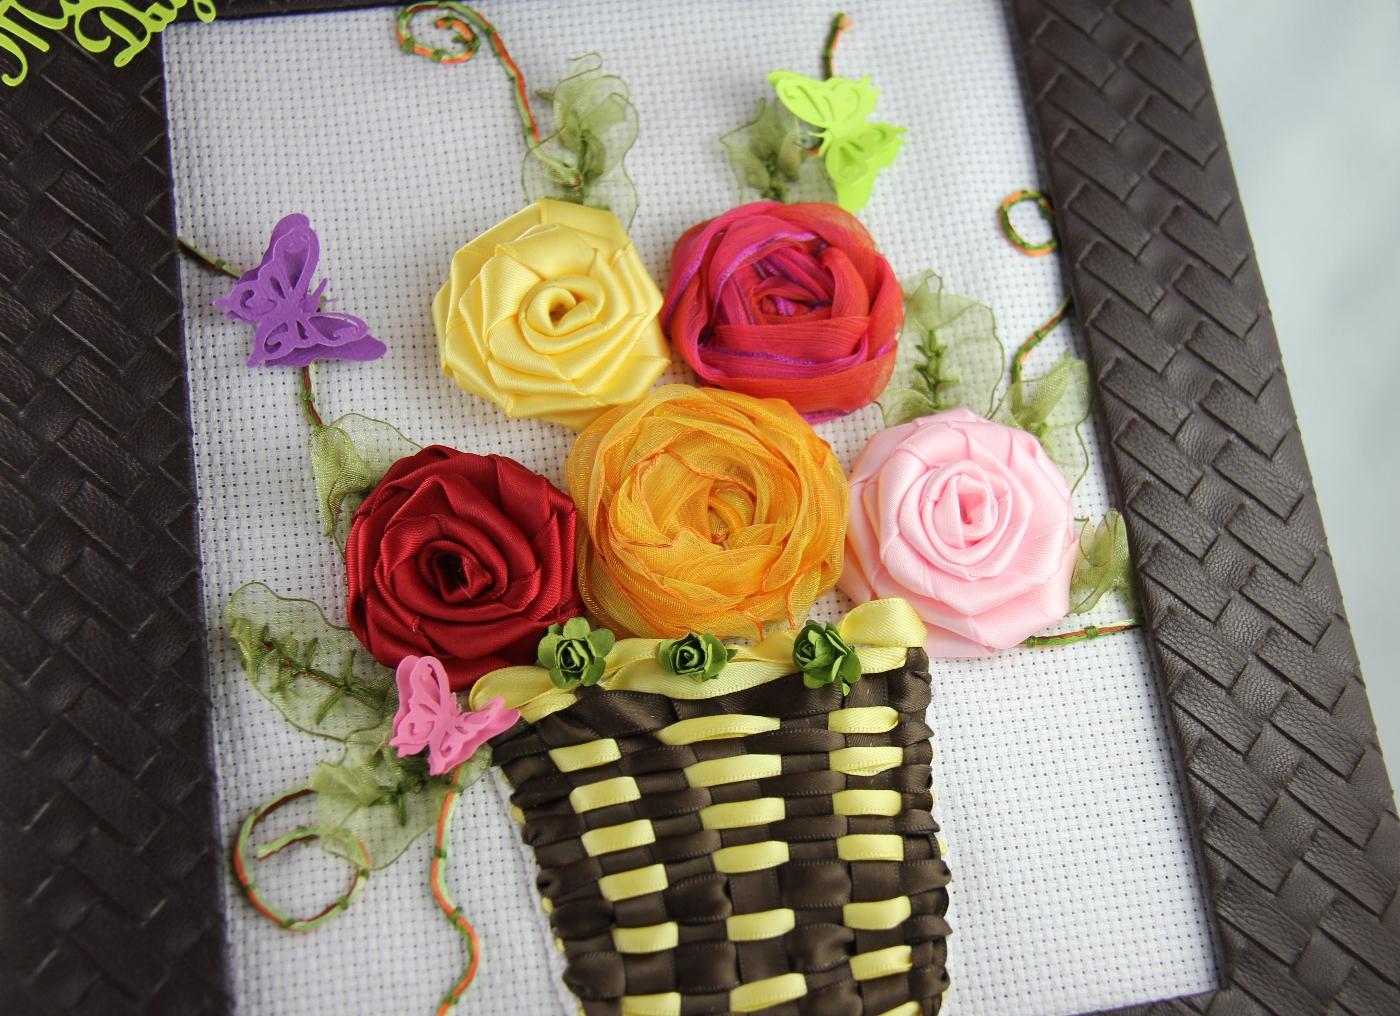 Jinkys Crafts Designs Framed Ribbon Spring Flowers